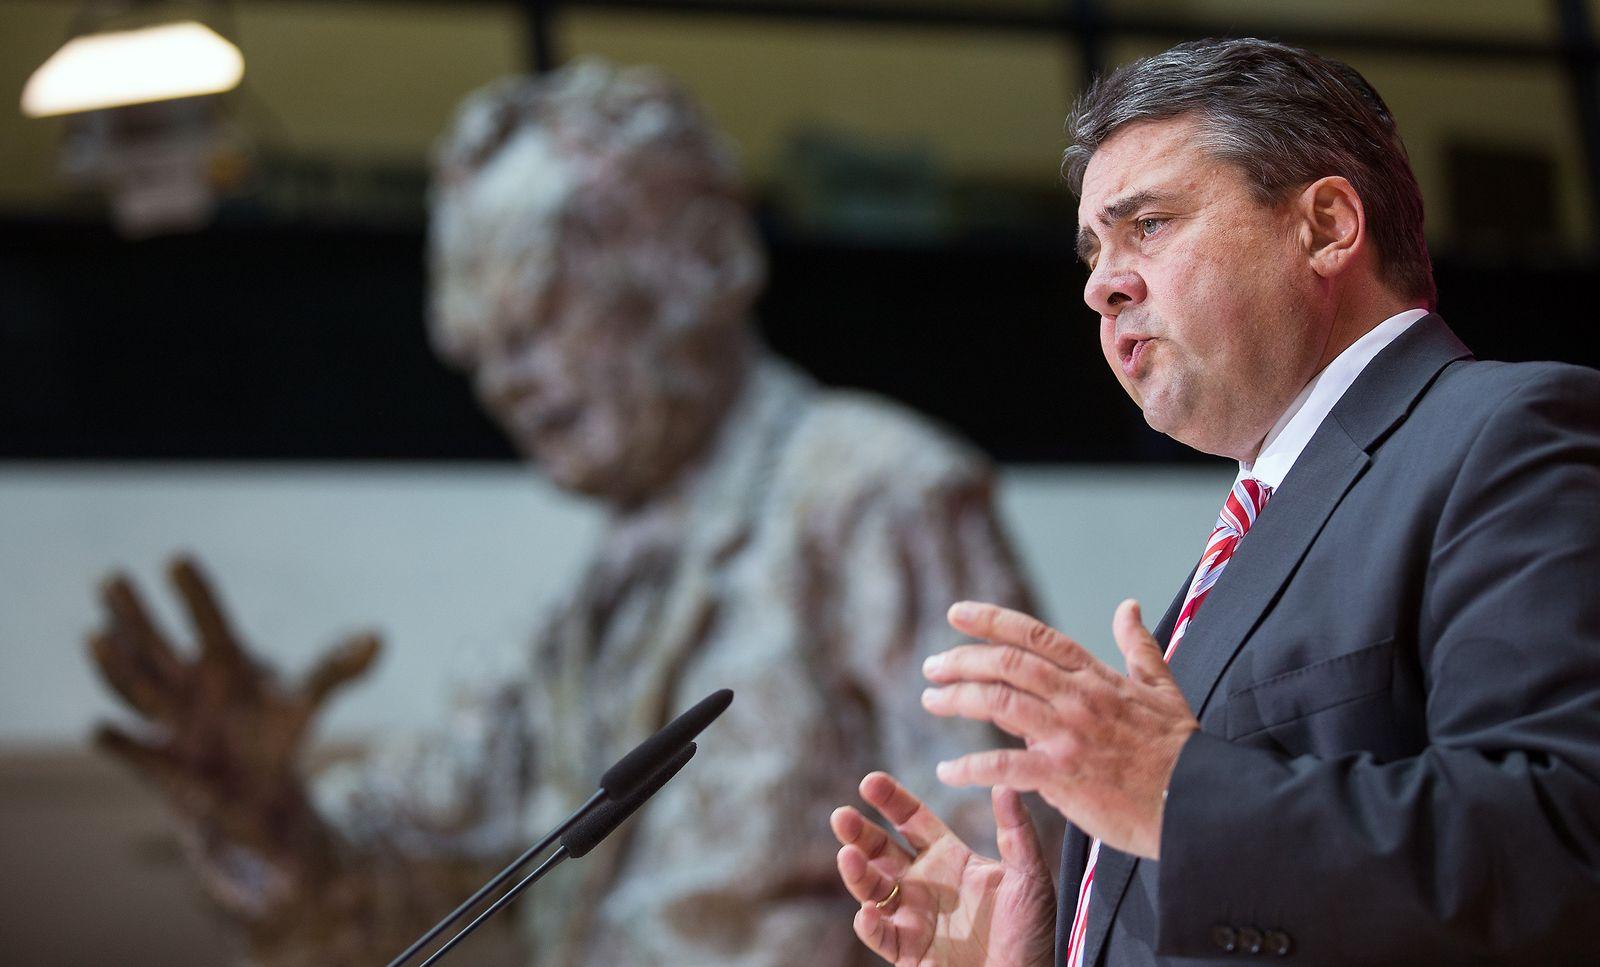 SPD-Parteikonvent/ Sigmar Gabriel